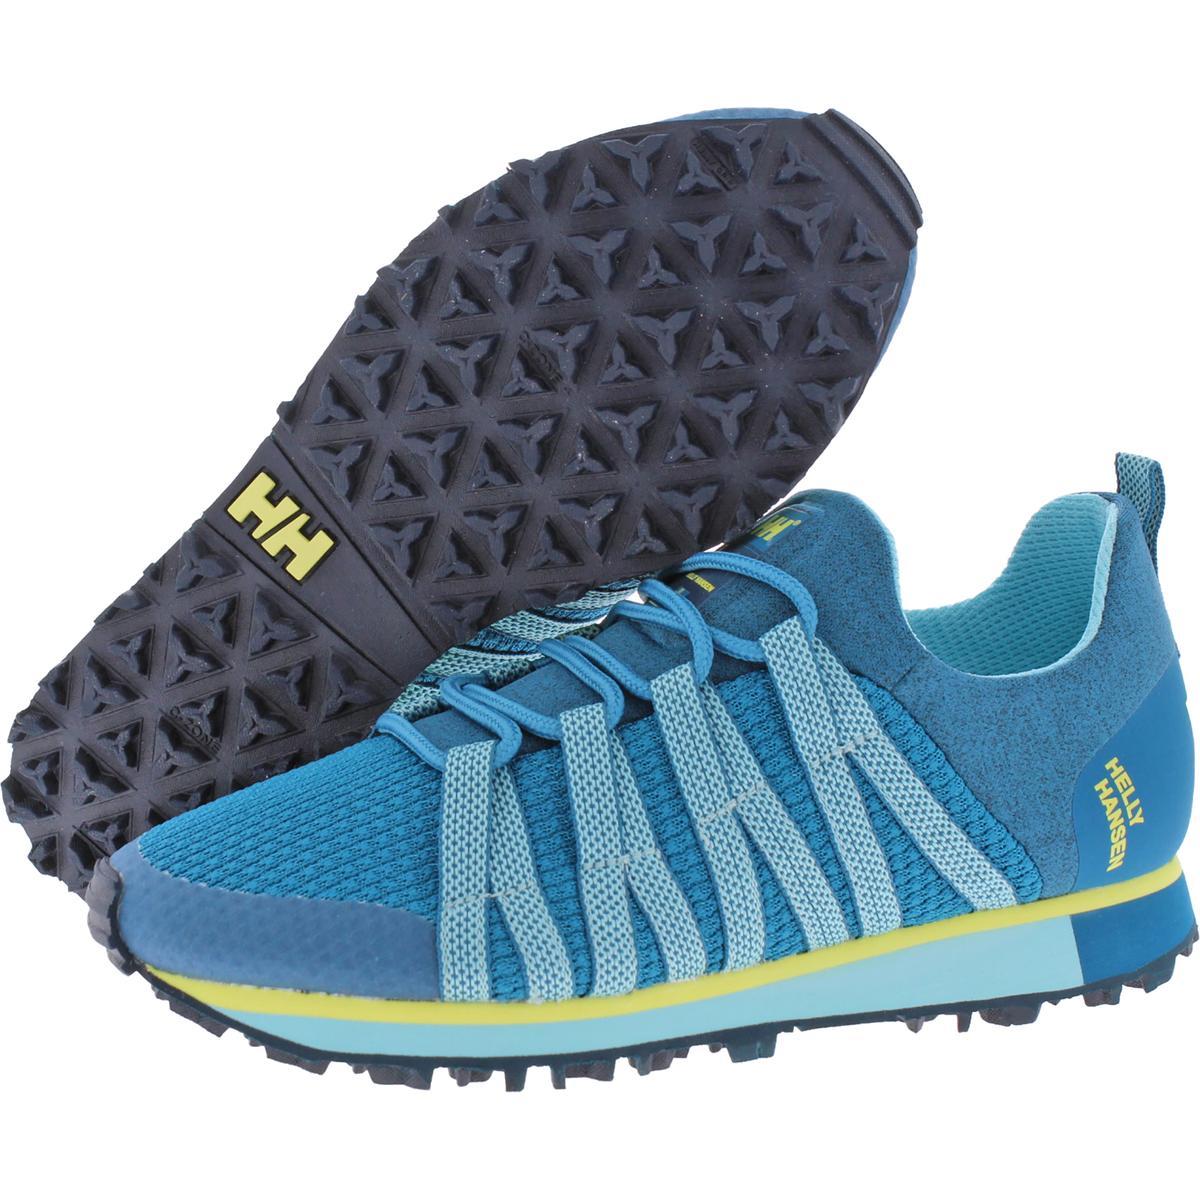 thumbnail 8 - Helly Hansen Womens Vardapeak V2 Fitness Performance Sneakers Shoes BHFO 9846